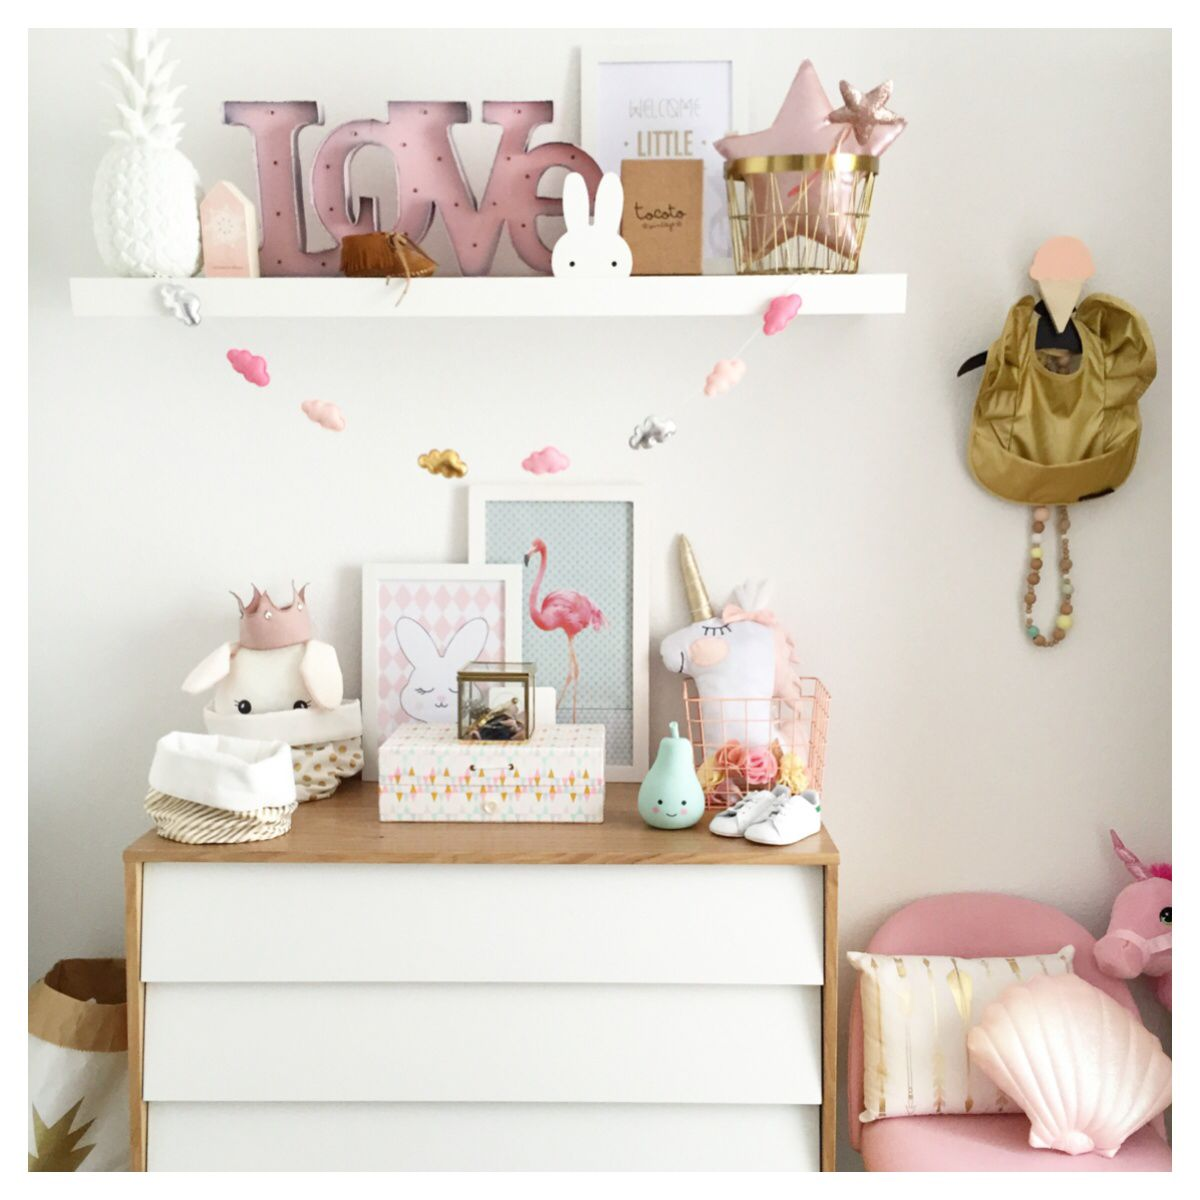 Favourite Scandinavian Nursery Kids Room Decor Items: Scandinavian Kids Room